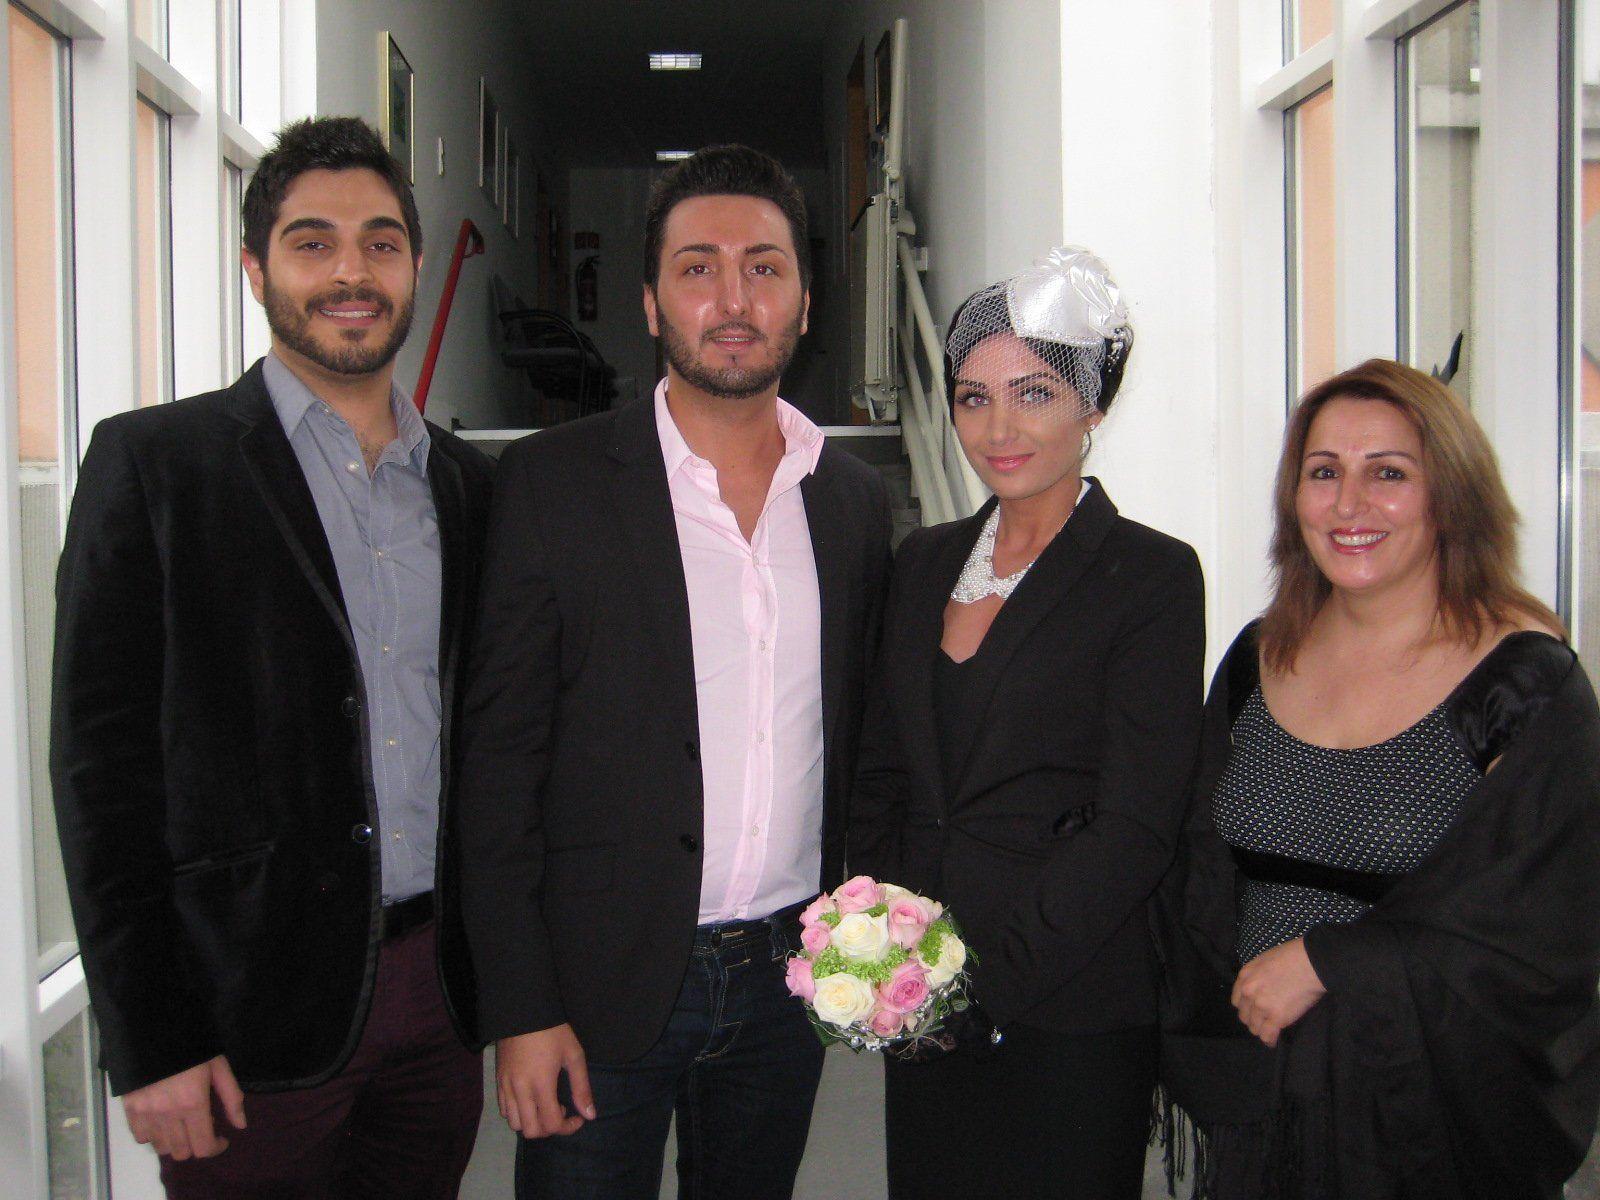 Selin Karahan und Güney Yilmaz haben geheiratet.